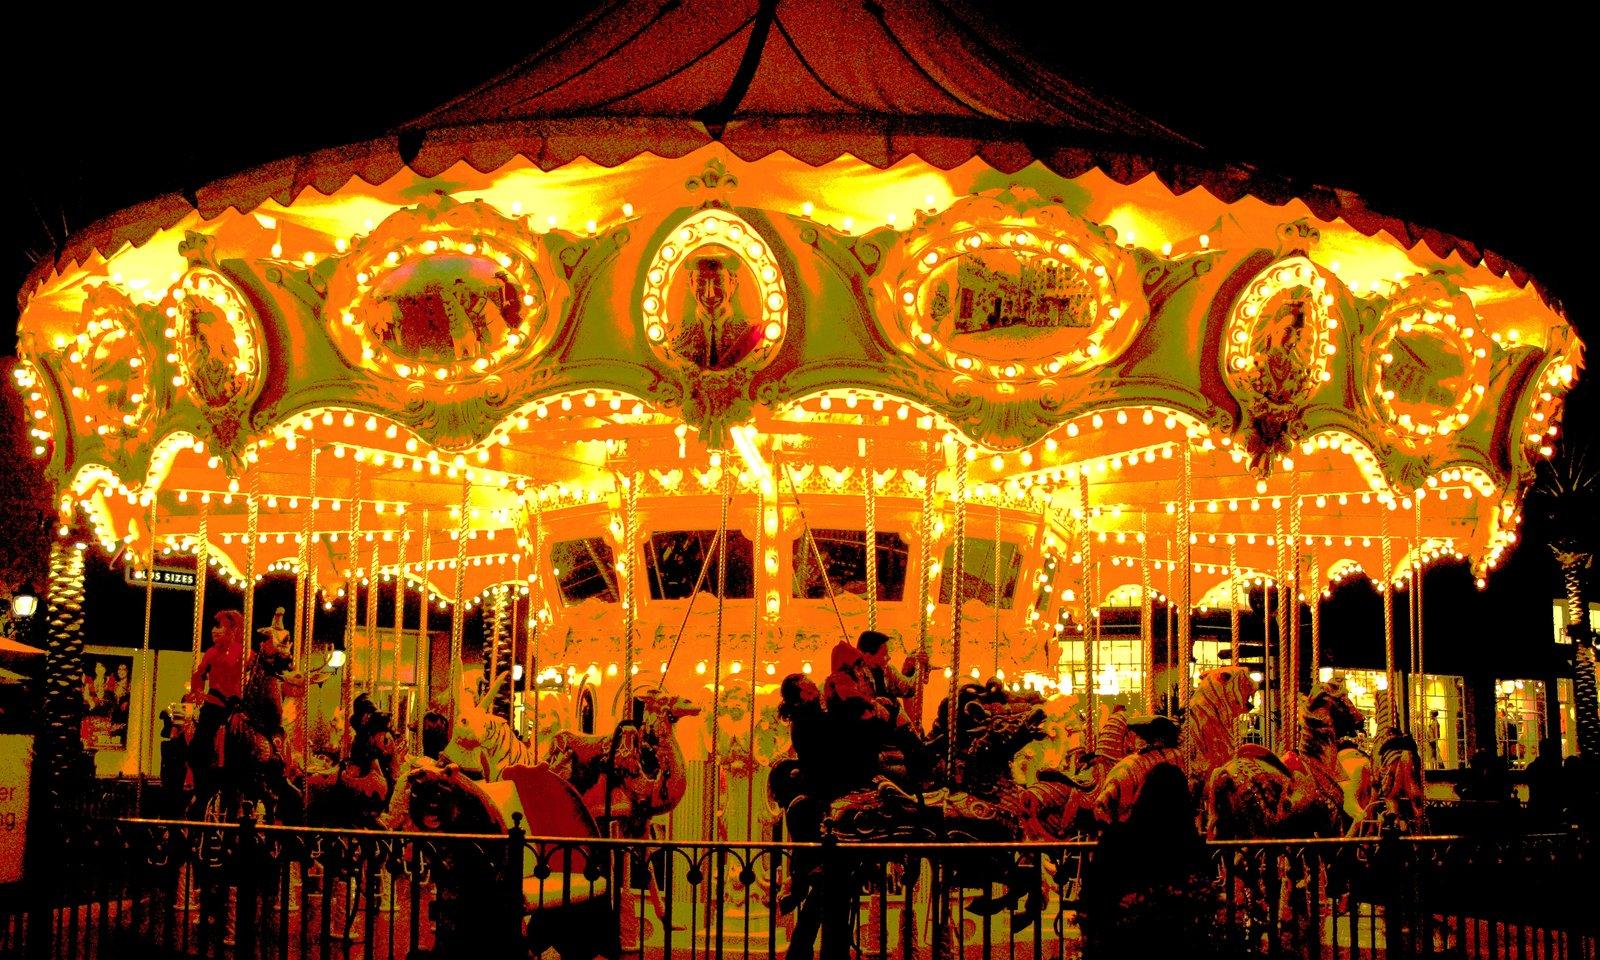 Vintage Merry Go Round by vokalpinoy 1600x960